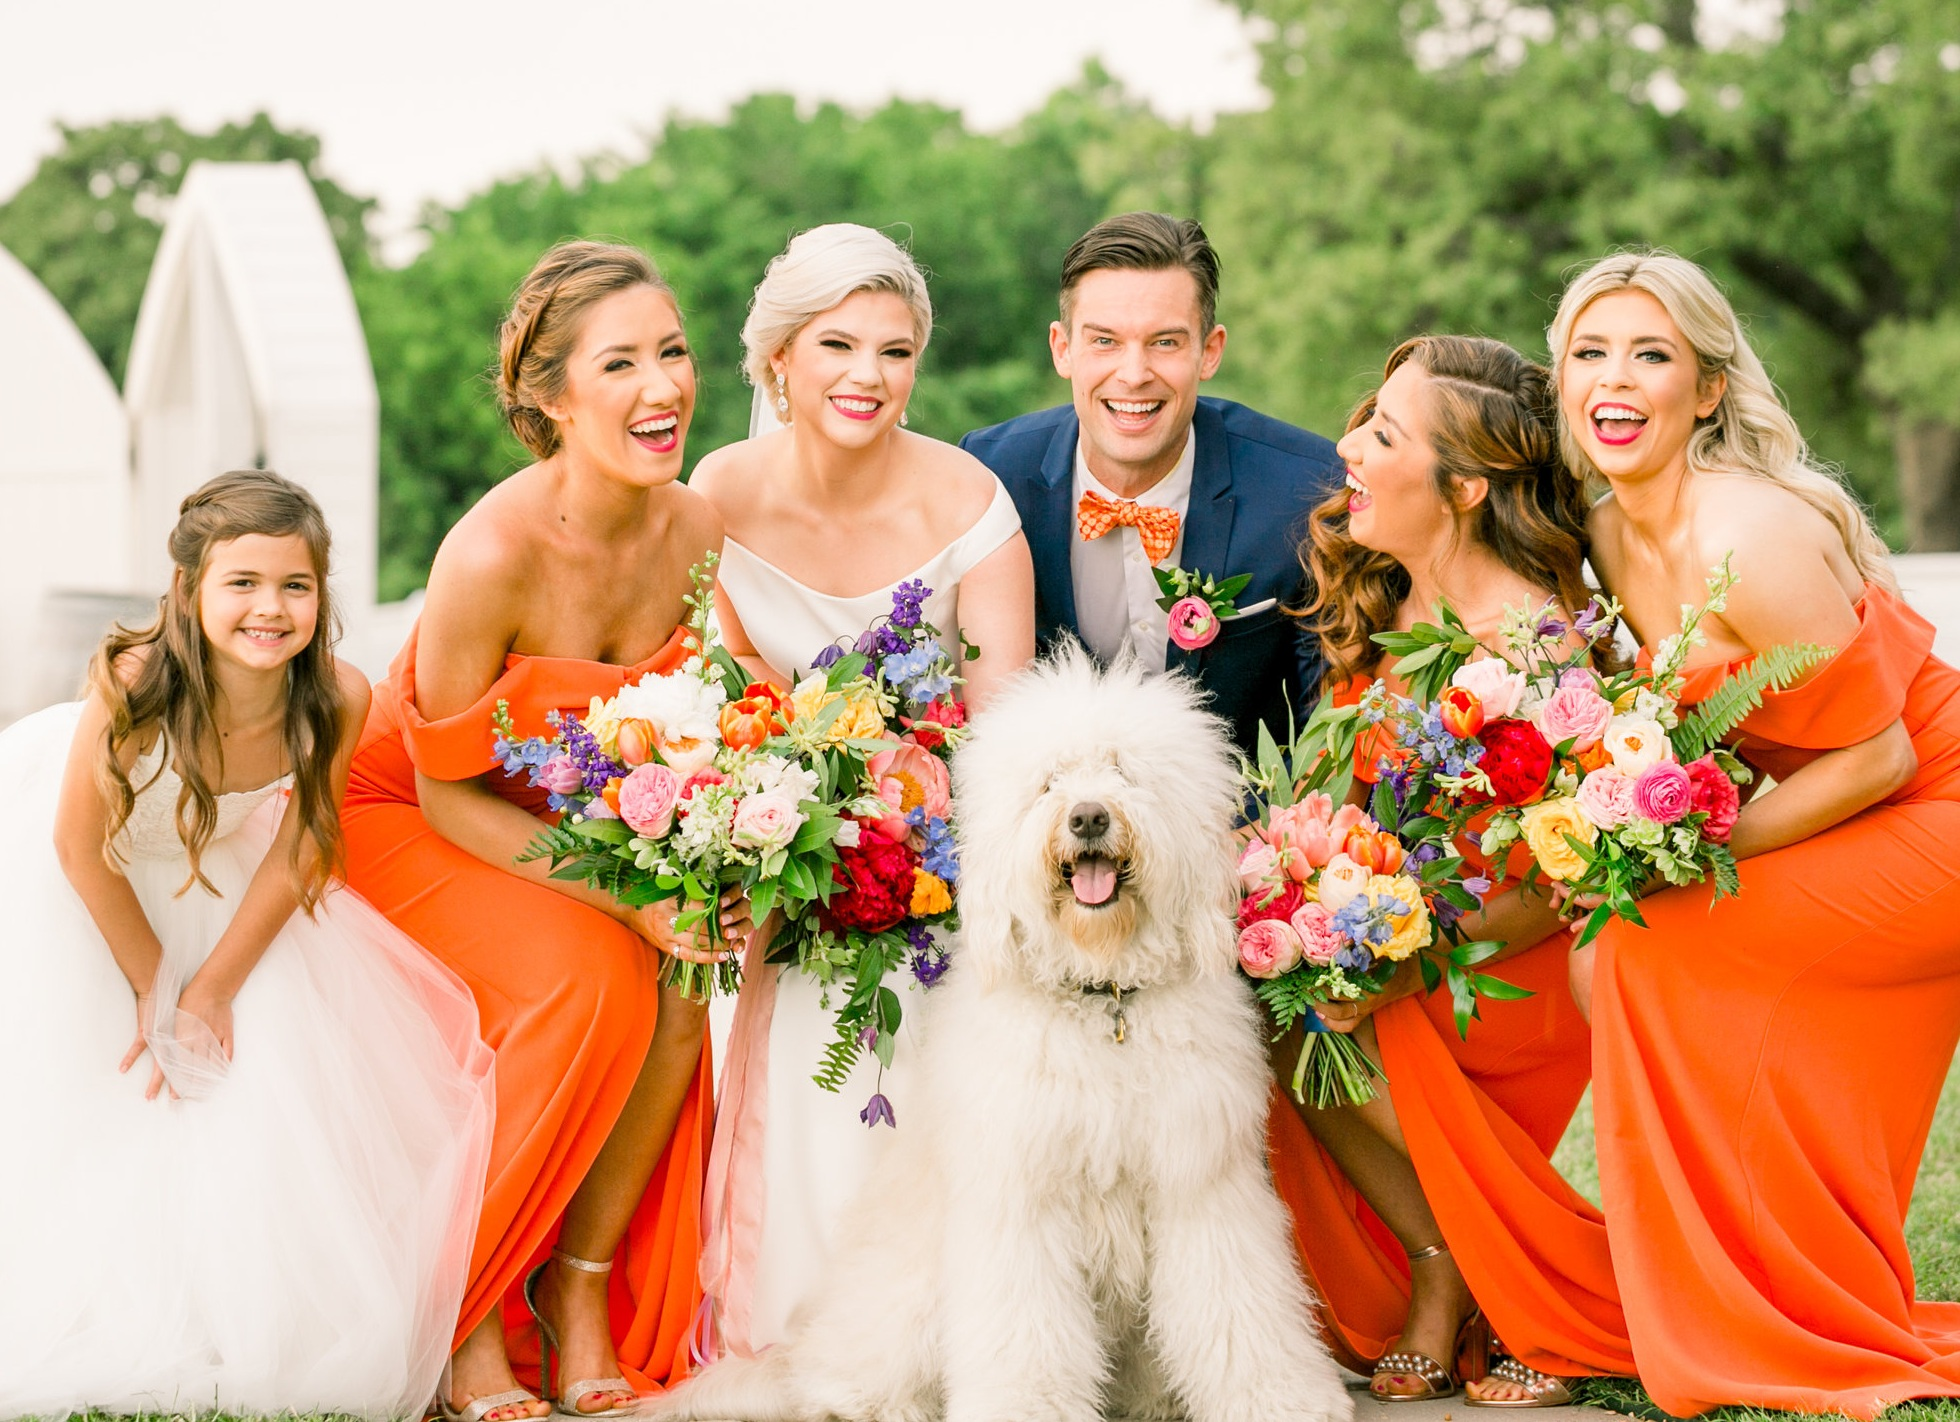 Couple Portrait with Floral Bouquet in Dallas, Texas